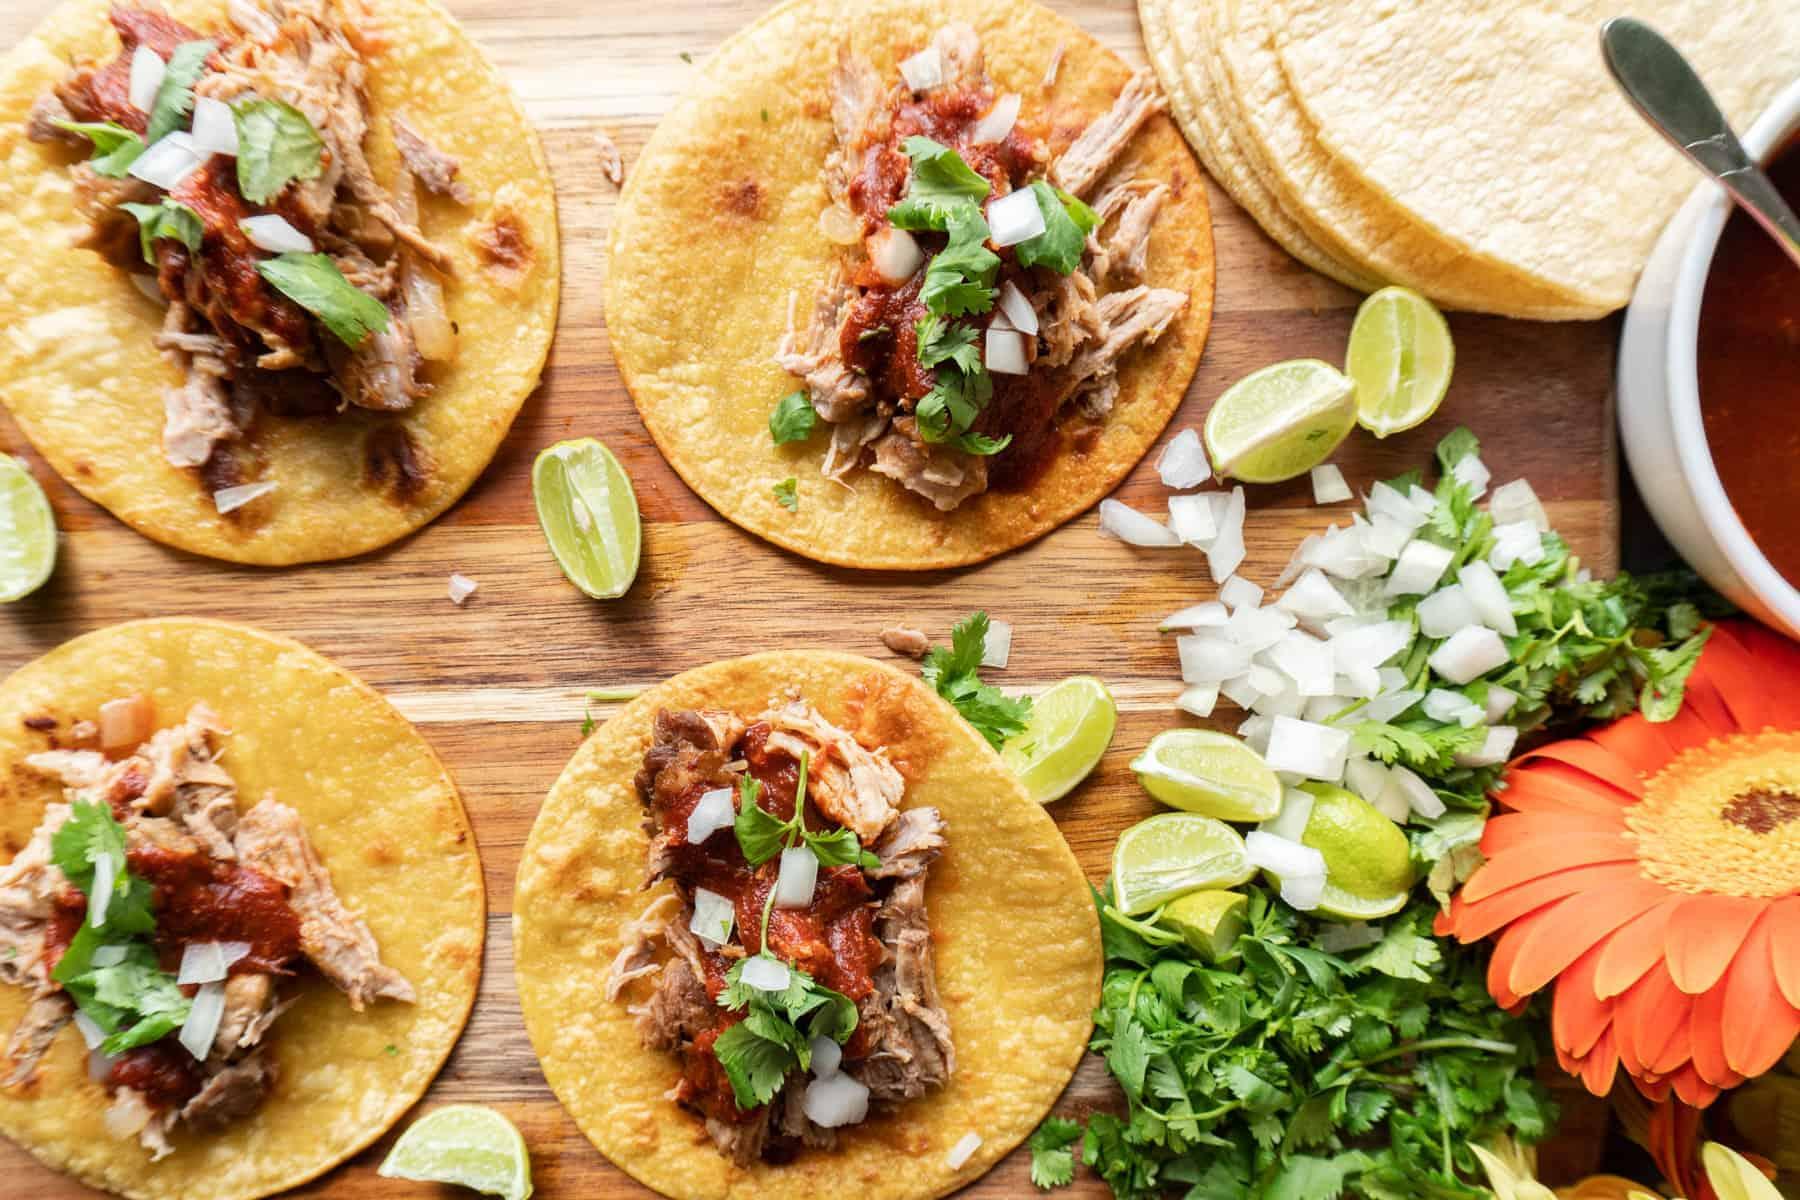 Flatlay of carnitas tacos